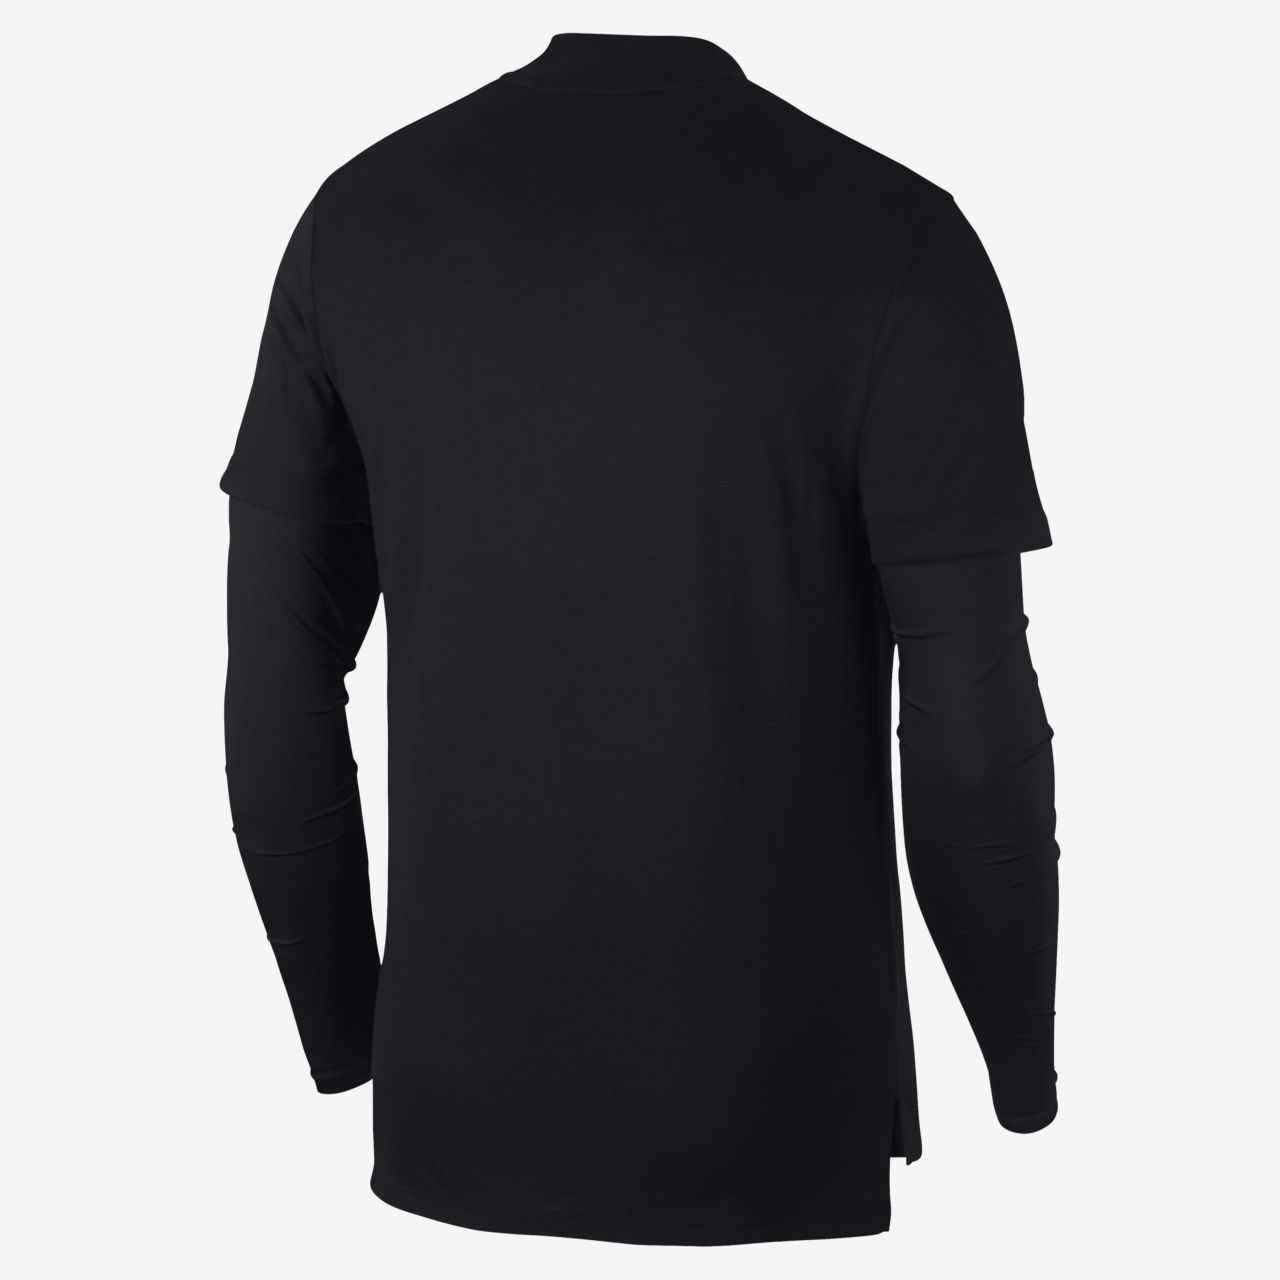 6c14bab94 Nike Run Division Rise 365 Men's Long-Sleeve Running Top. Nike.com IE